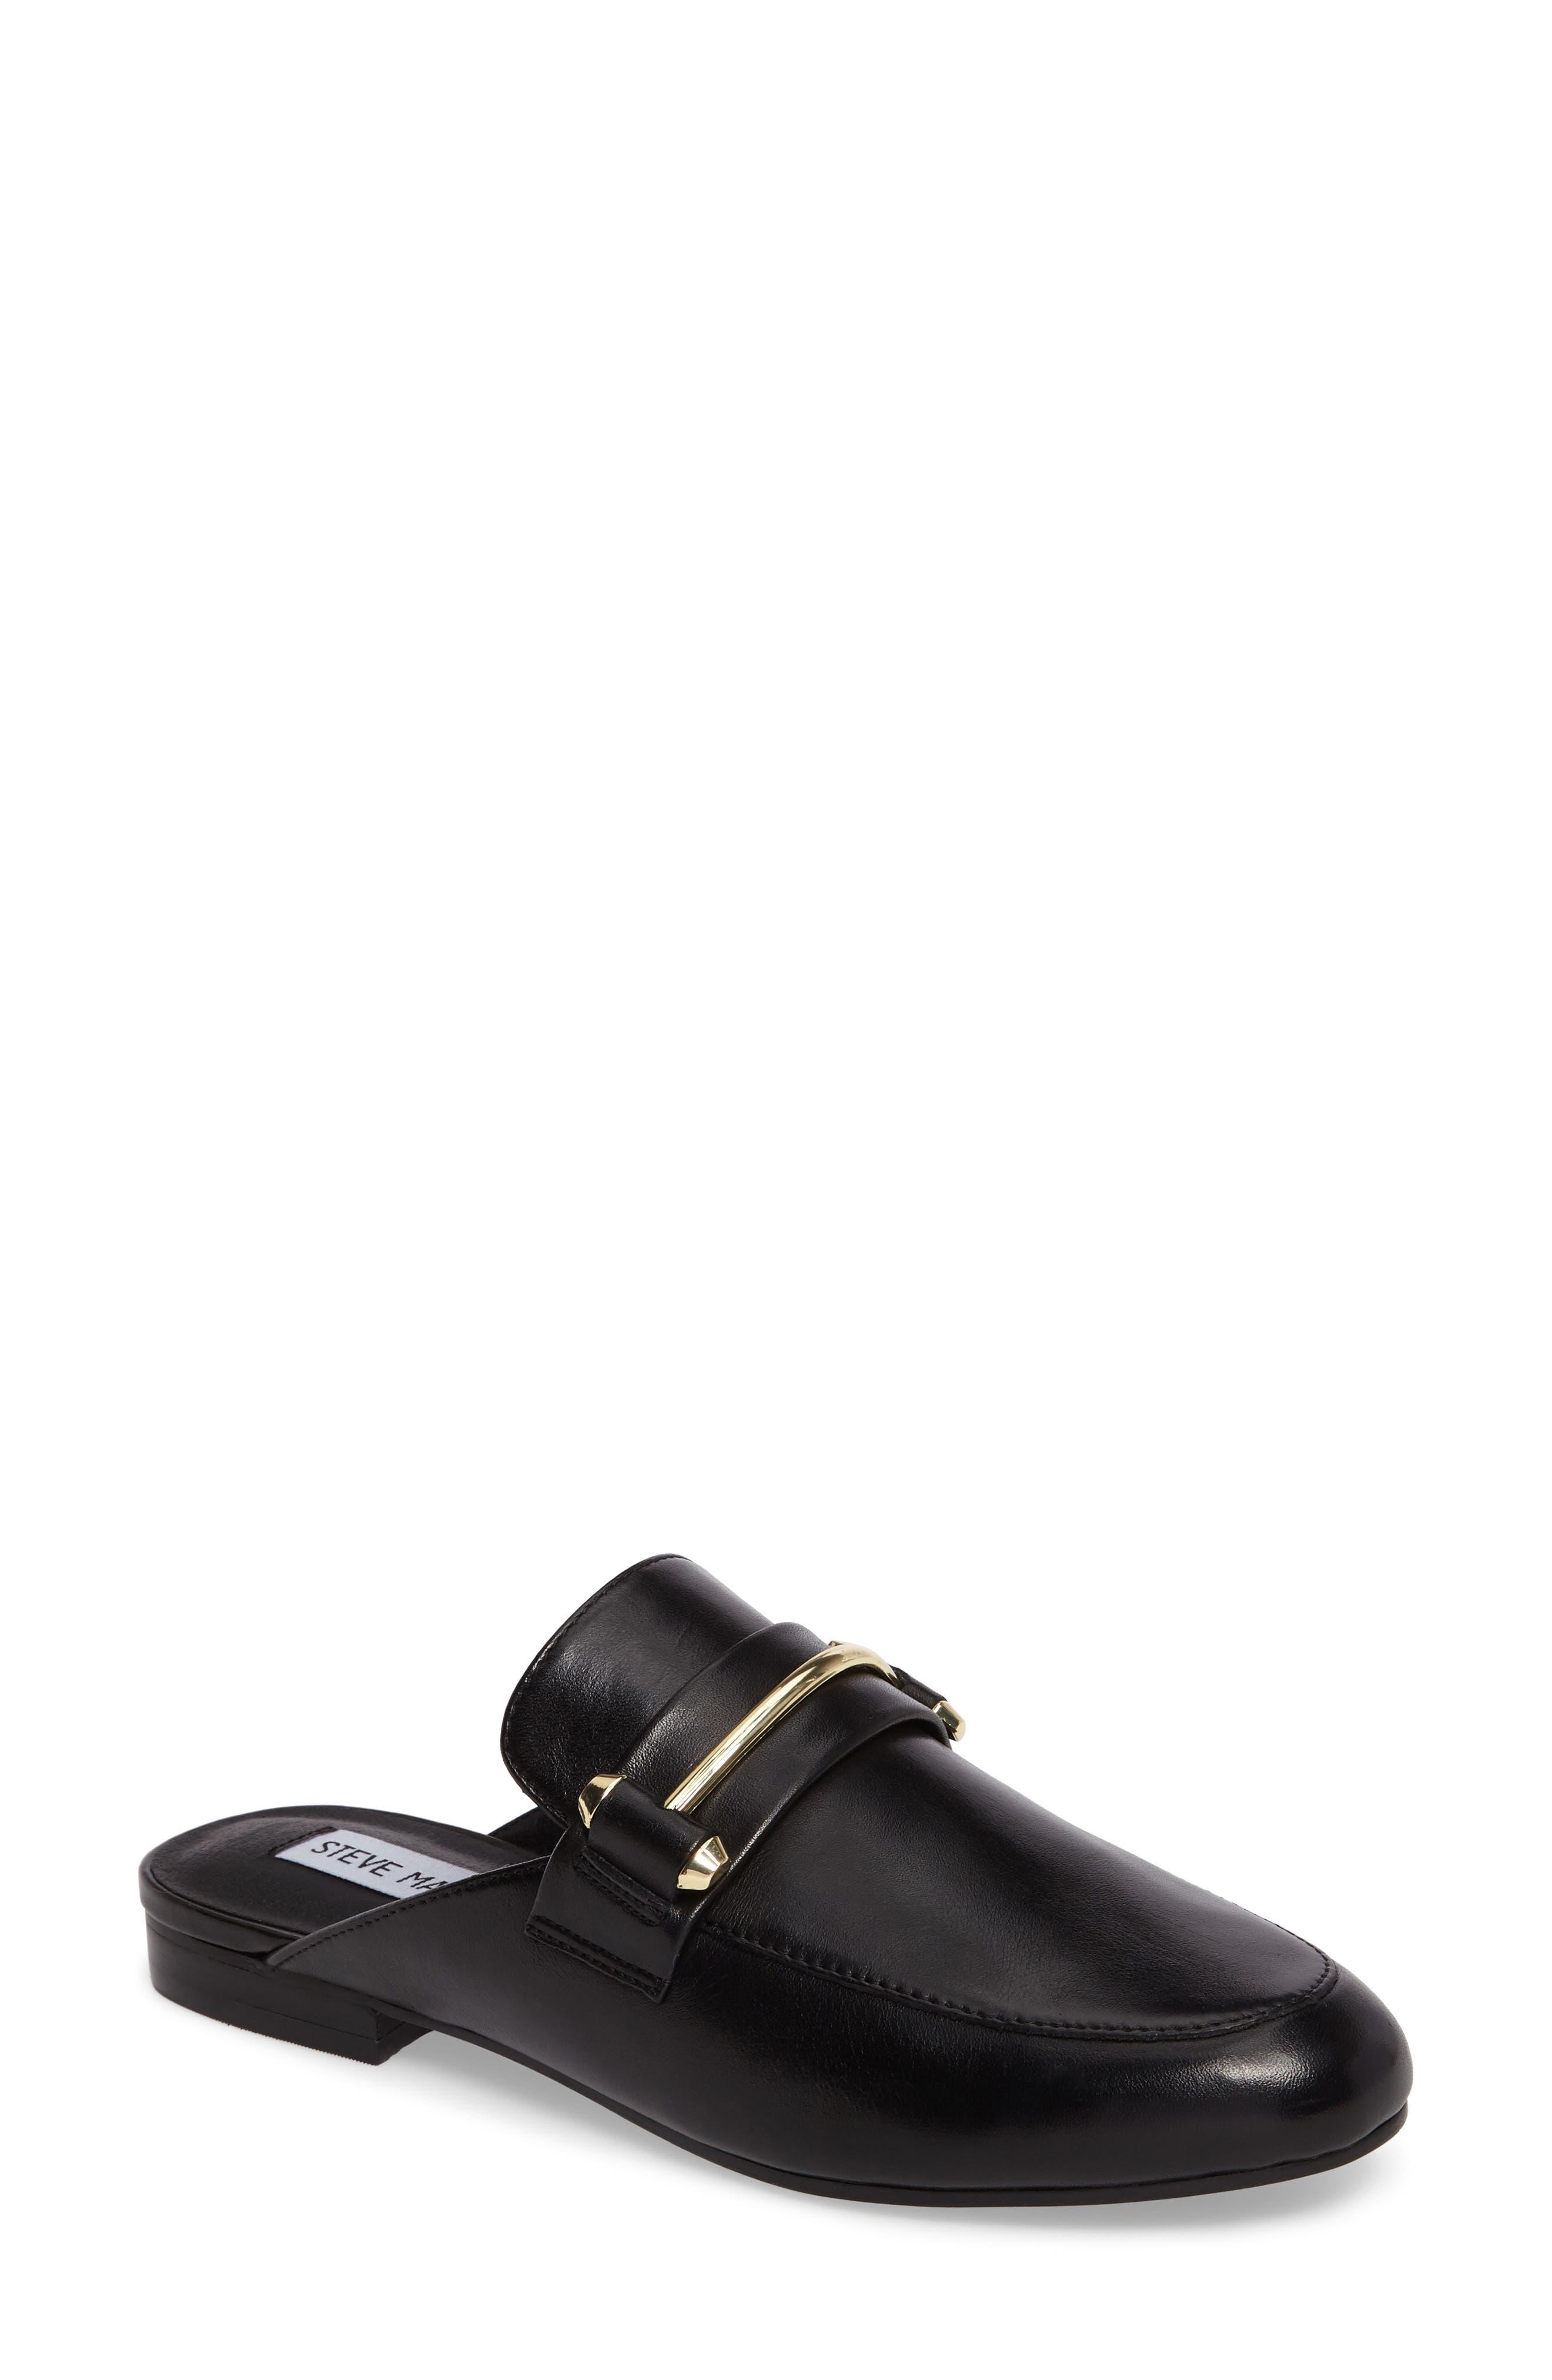 Kera Flat Loafer Mule,                         Main,                         color, Black Leather